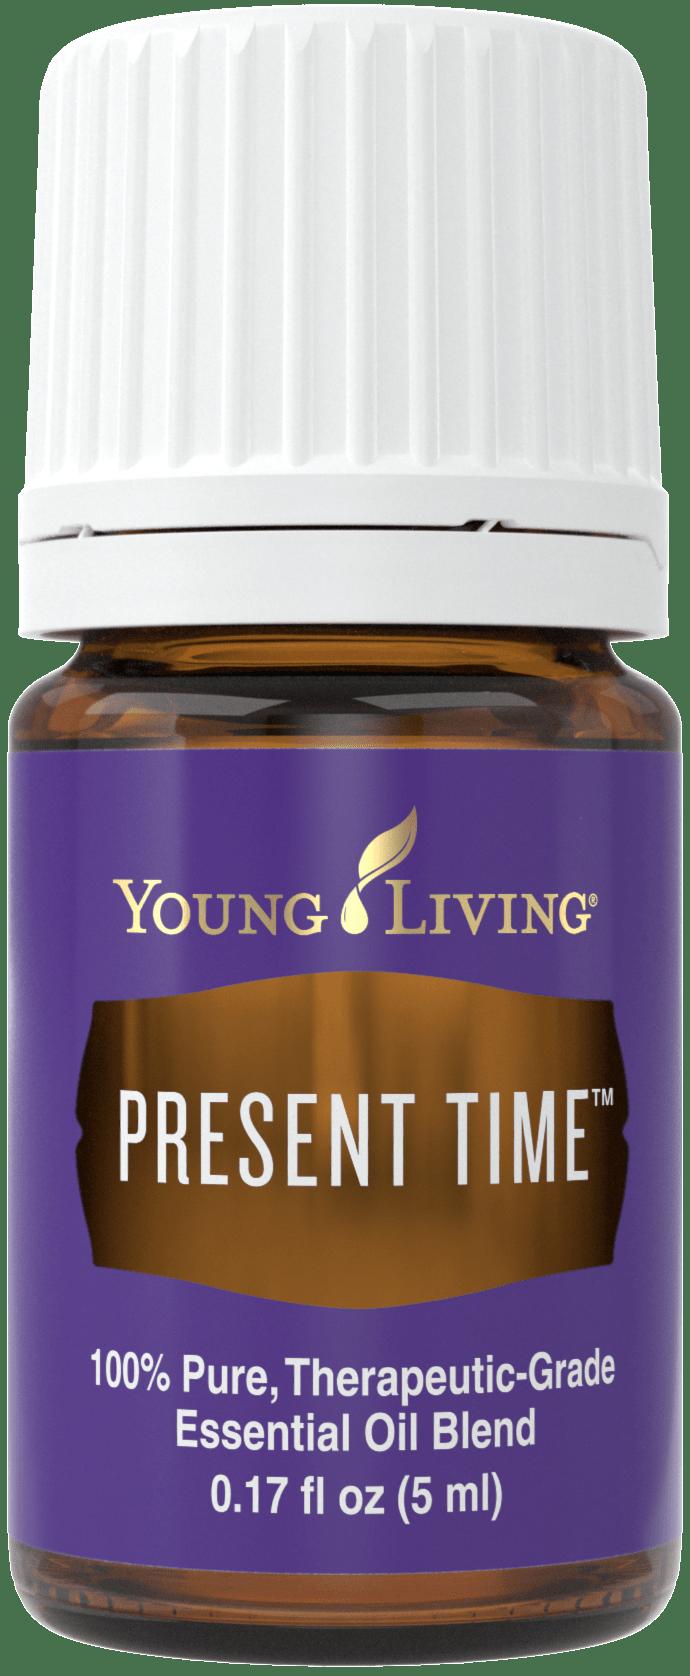 Ätherisches Öl Young Living: Present Time Öl (Im hier & jetzt) 5ml